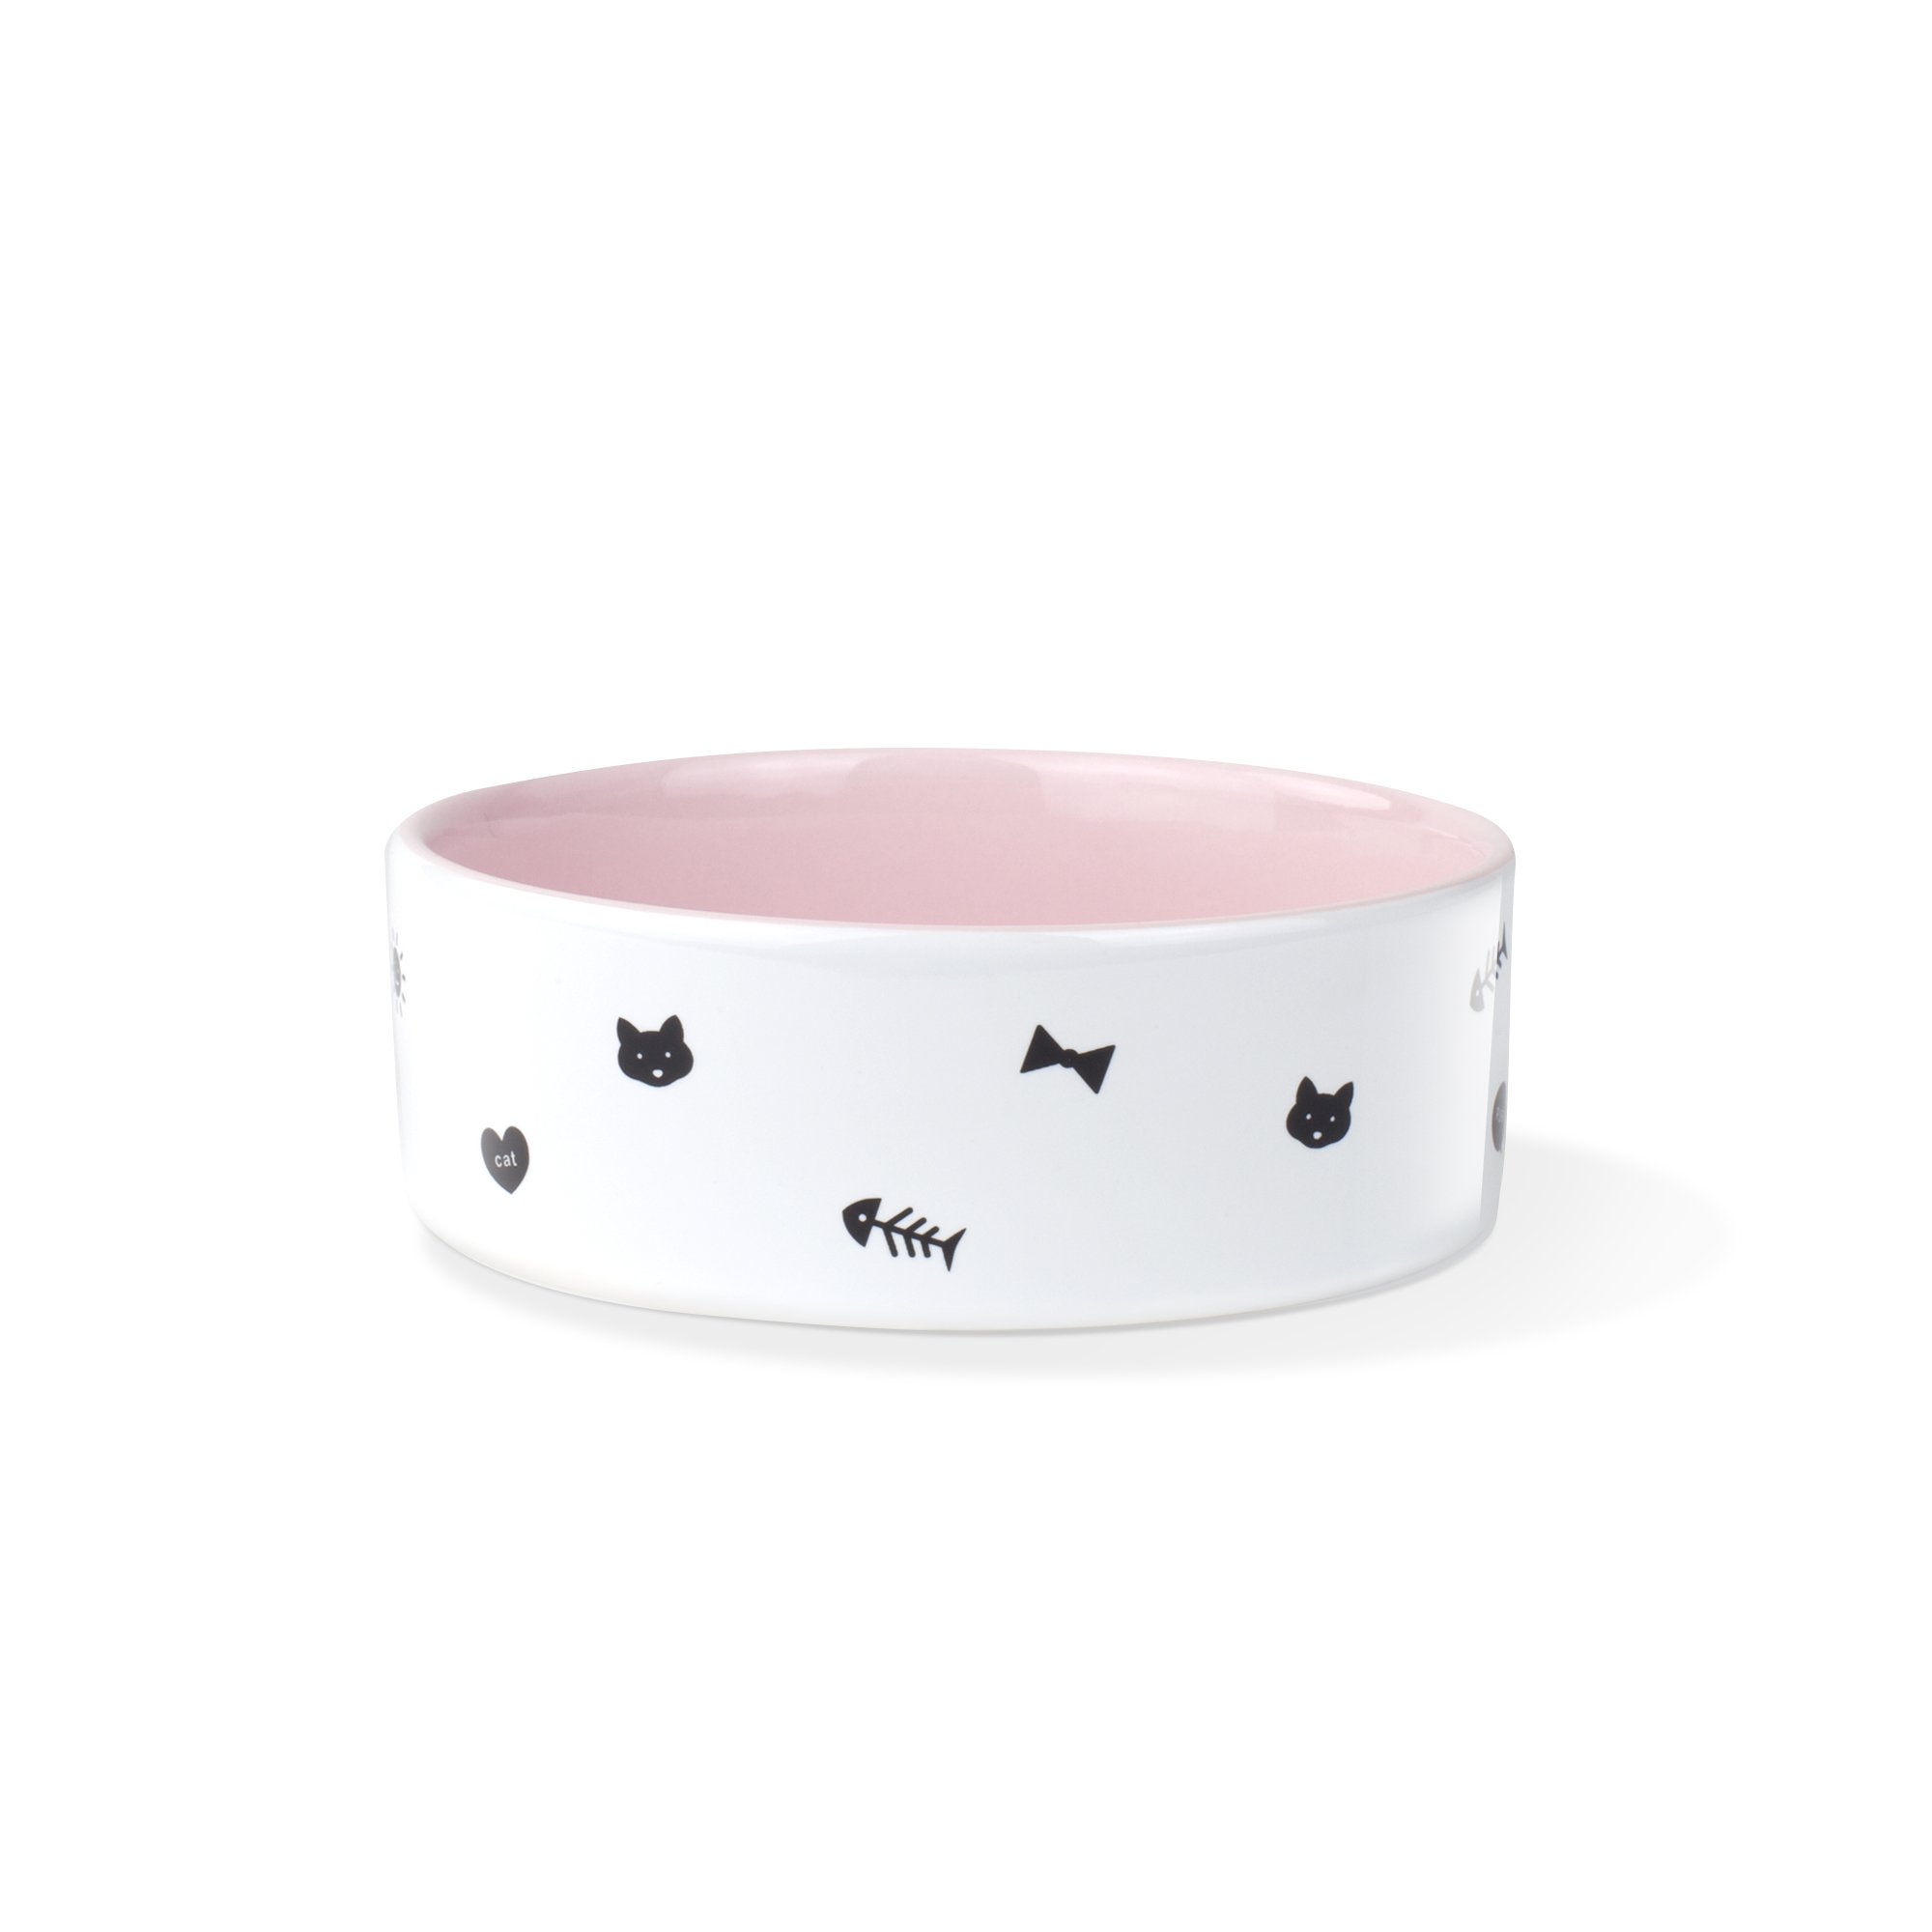 Fringe Studio Kitty Boss Small Straight Bowl (473040)